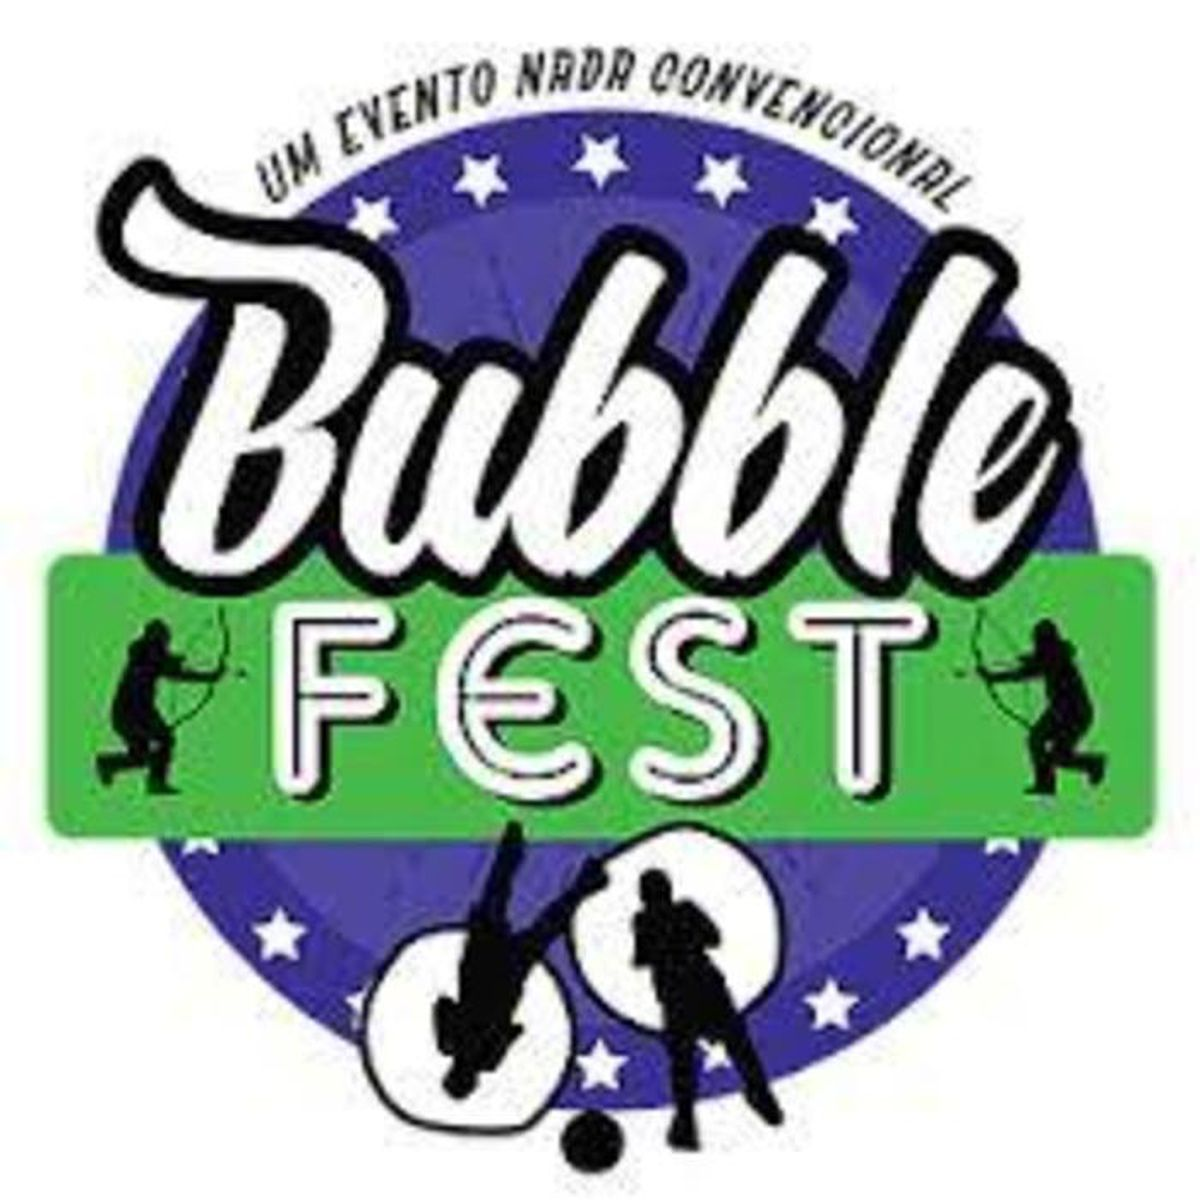 Projeto Happy Day - Bubble Fest - Fundação Iniciativa